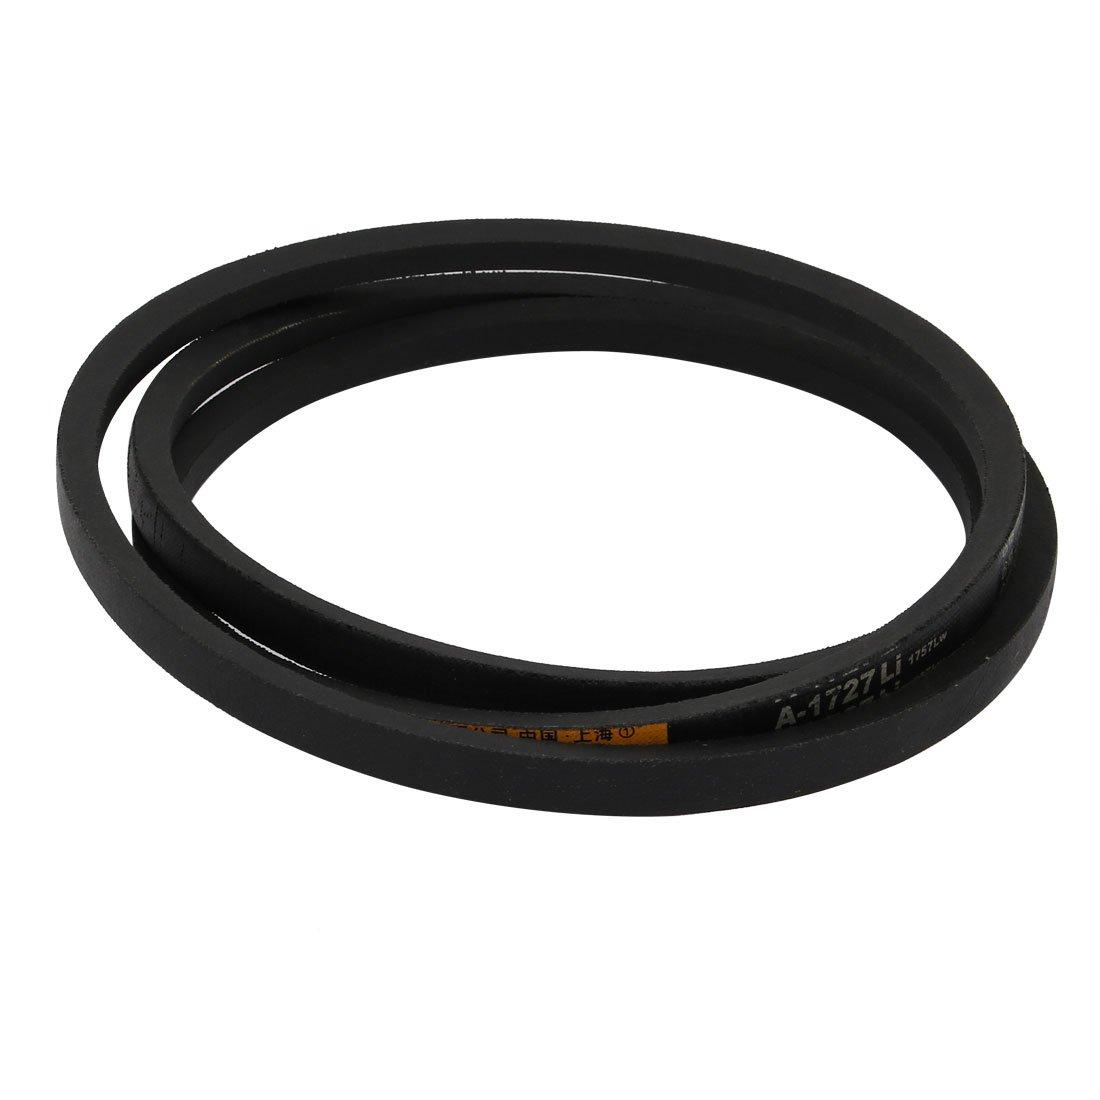 sourcingmap A1727 13mm Width 8mm Thickness Rubber Transmission Drive V-Belt